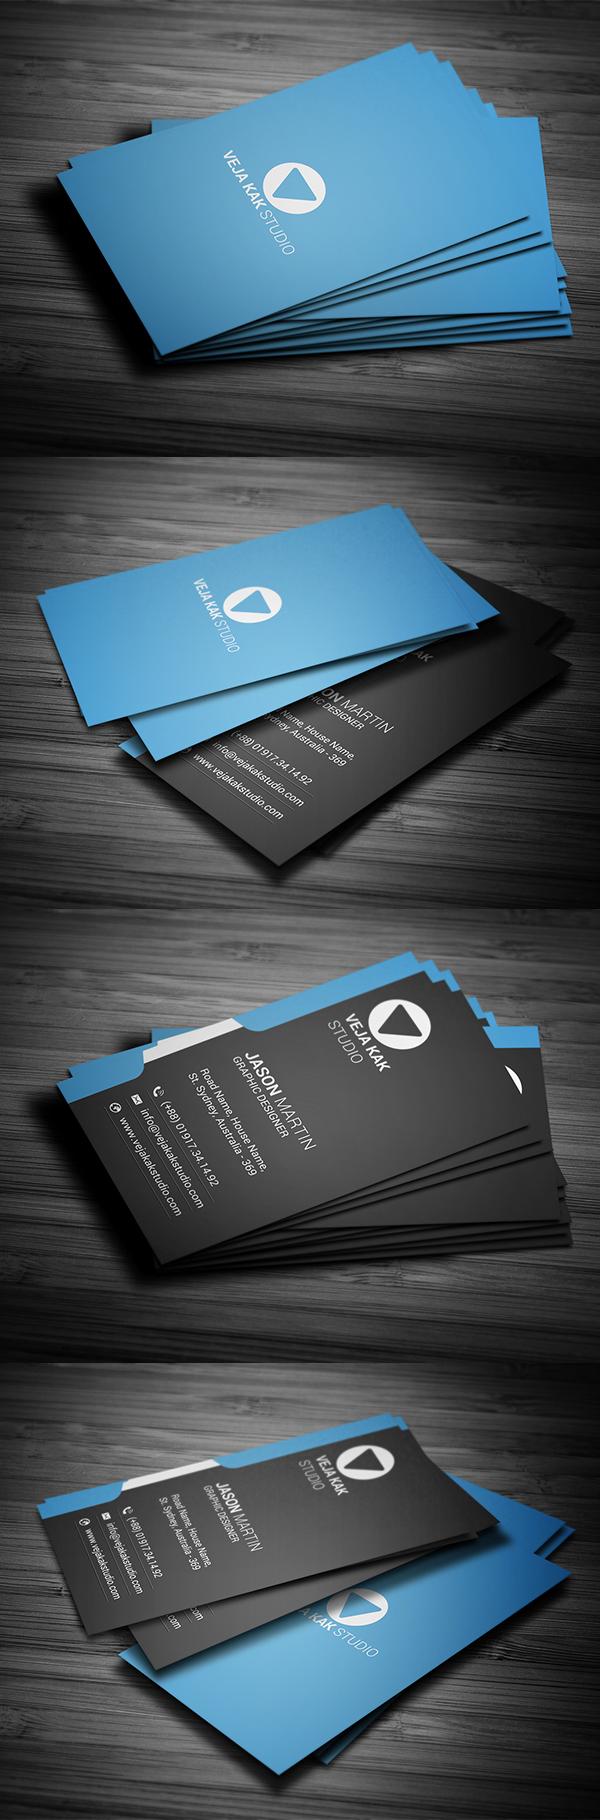 23 Business Card Design